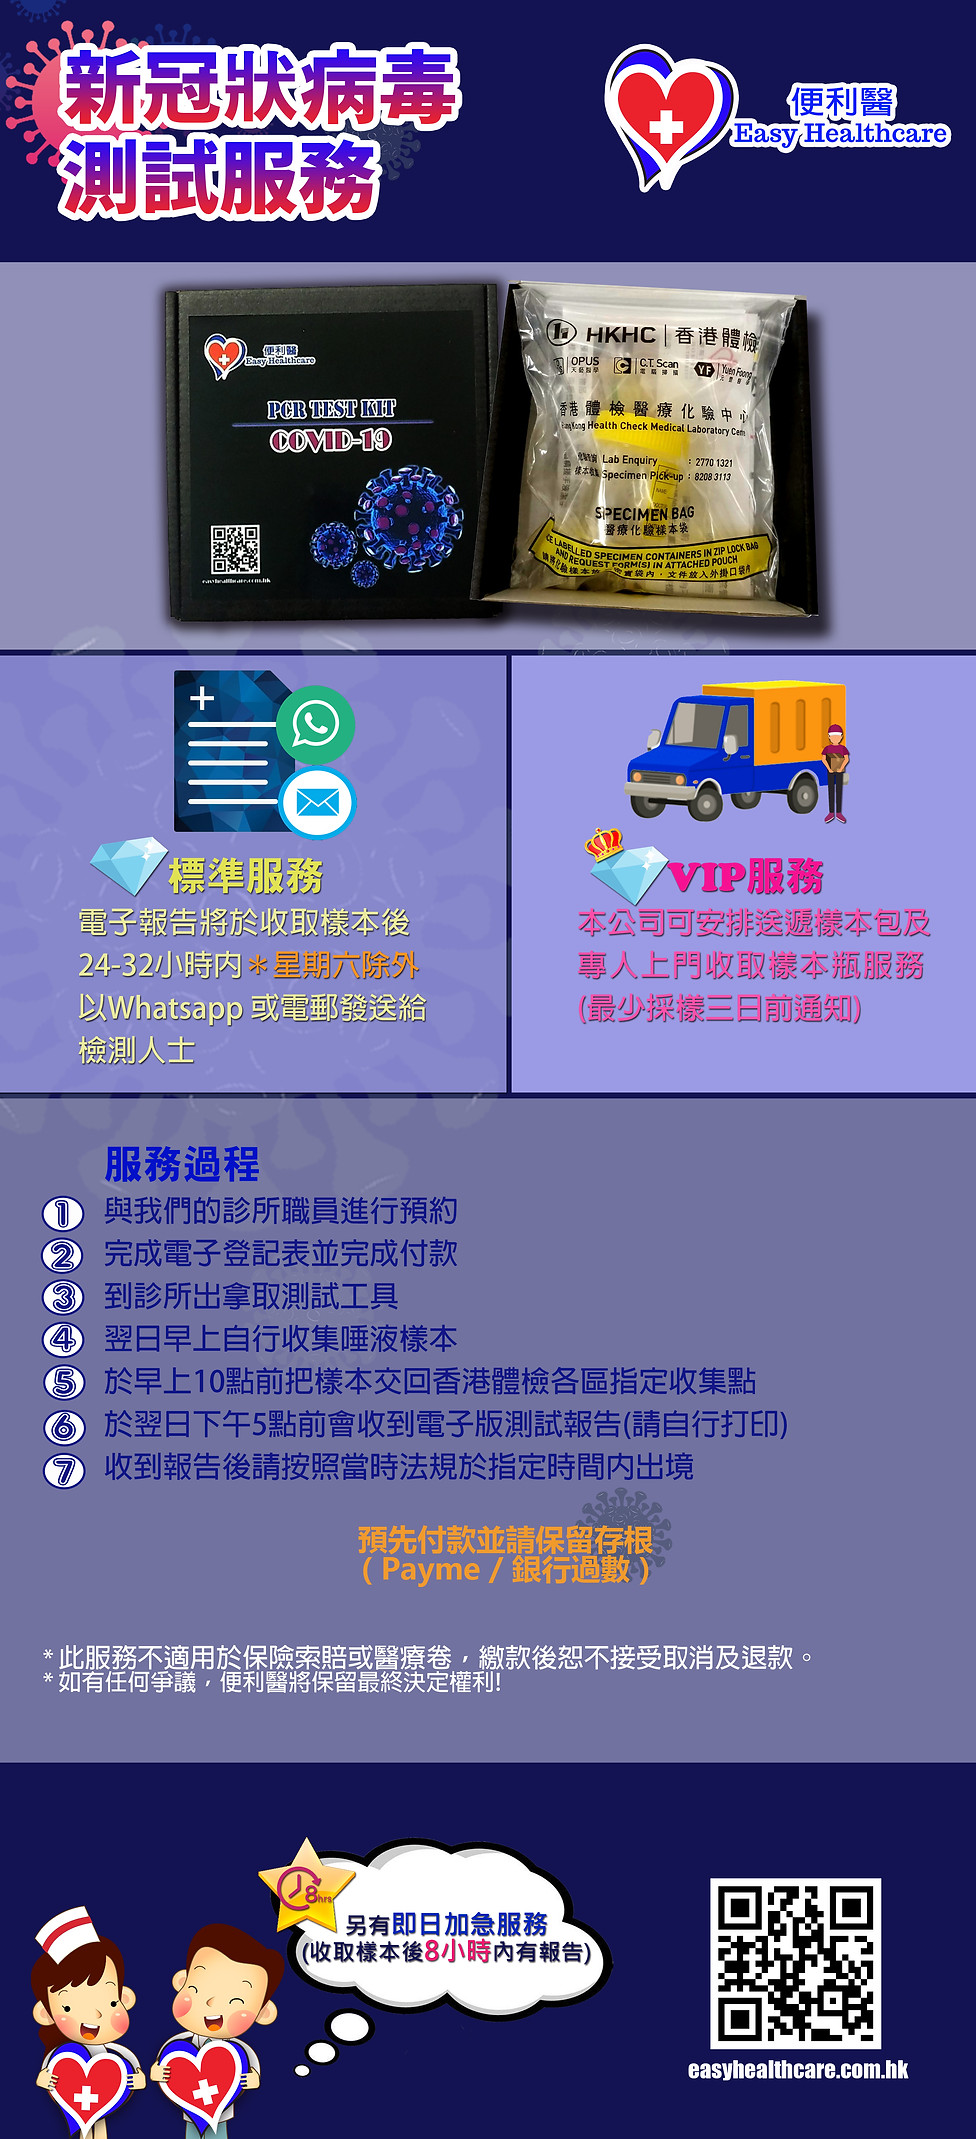 COVID-19 test packing(web)中.jpg